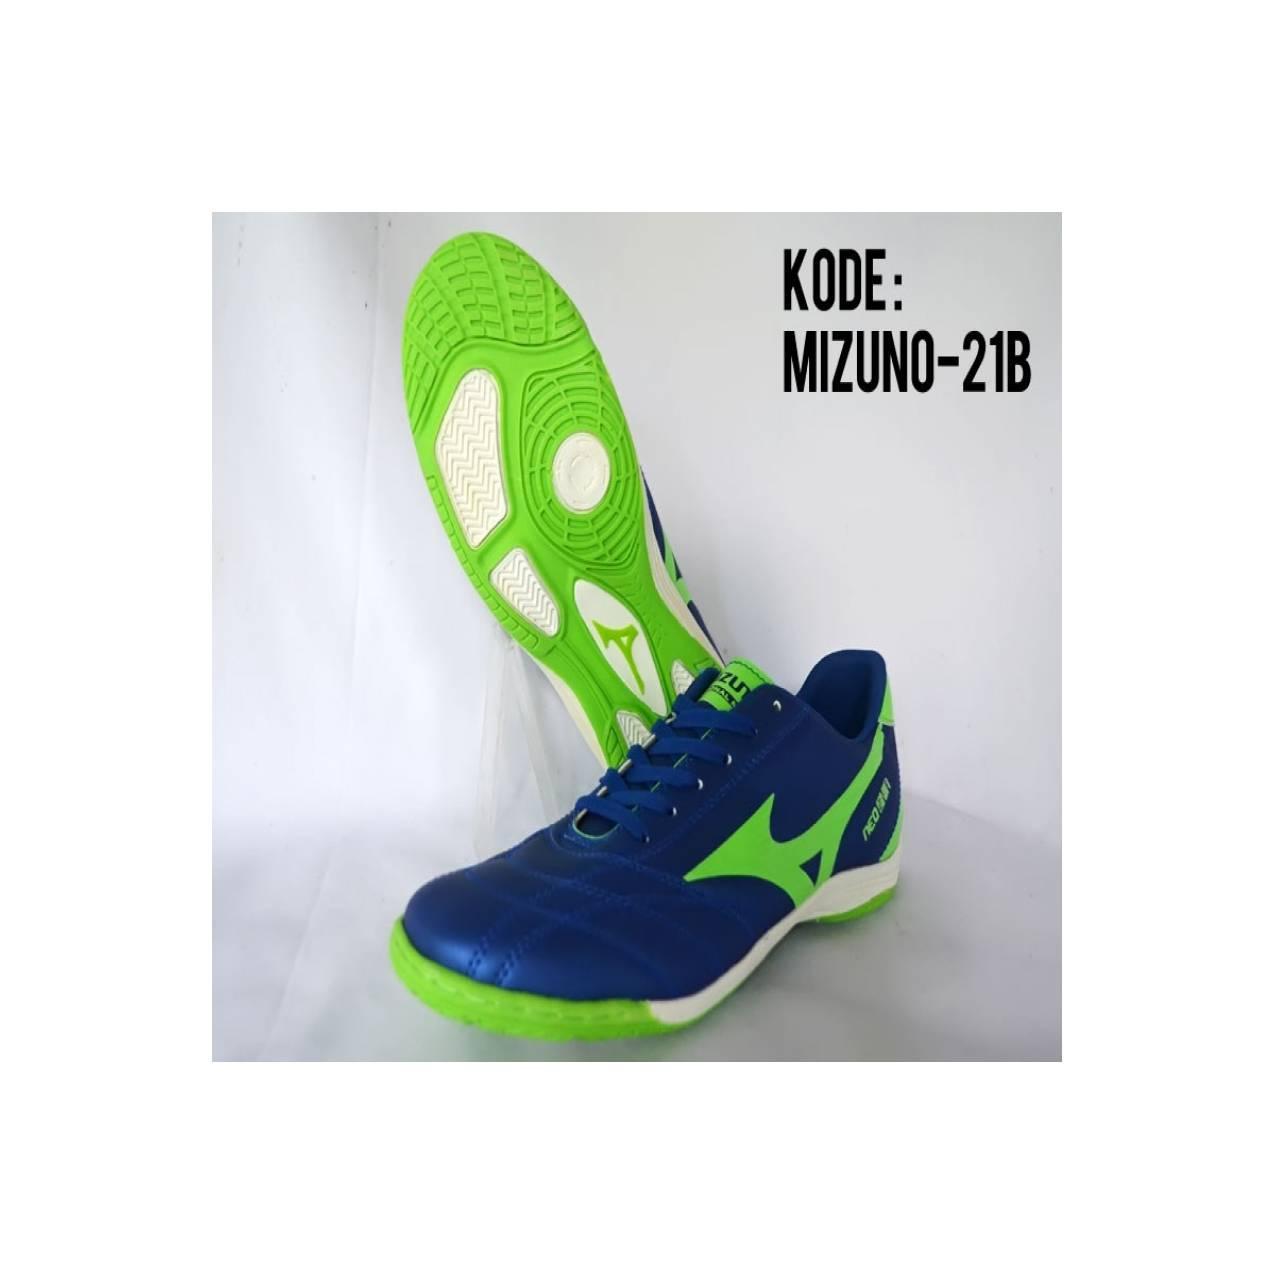 Sepatu Futsal Mizuno KW 1 Kode Mizuno 21B